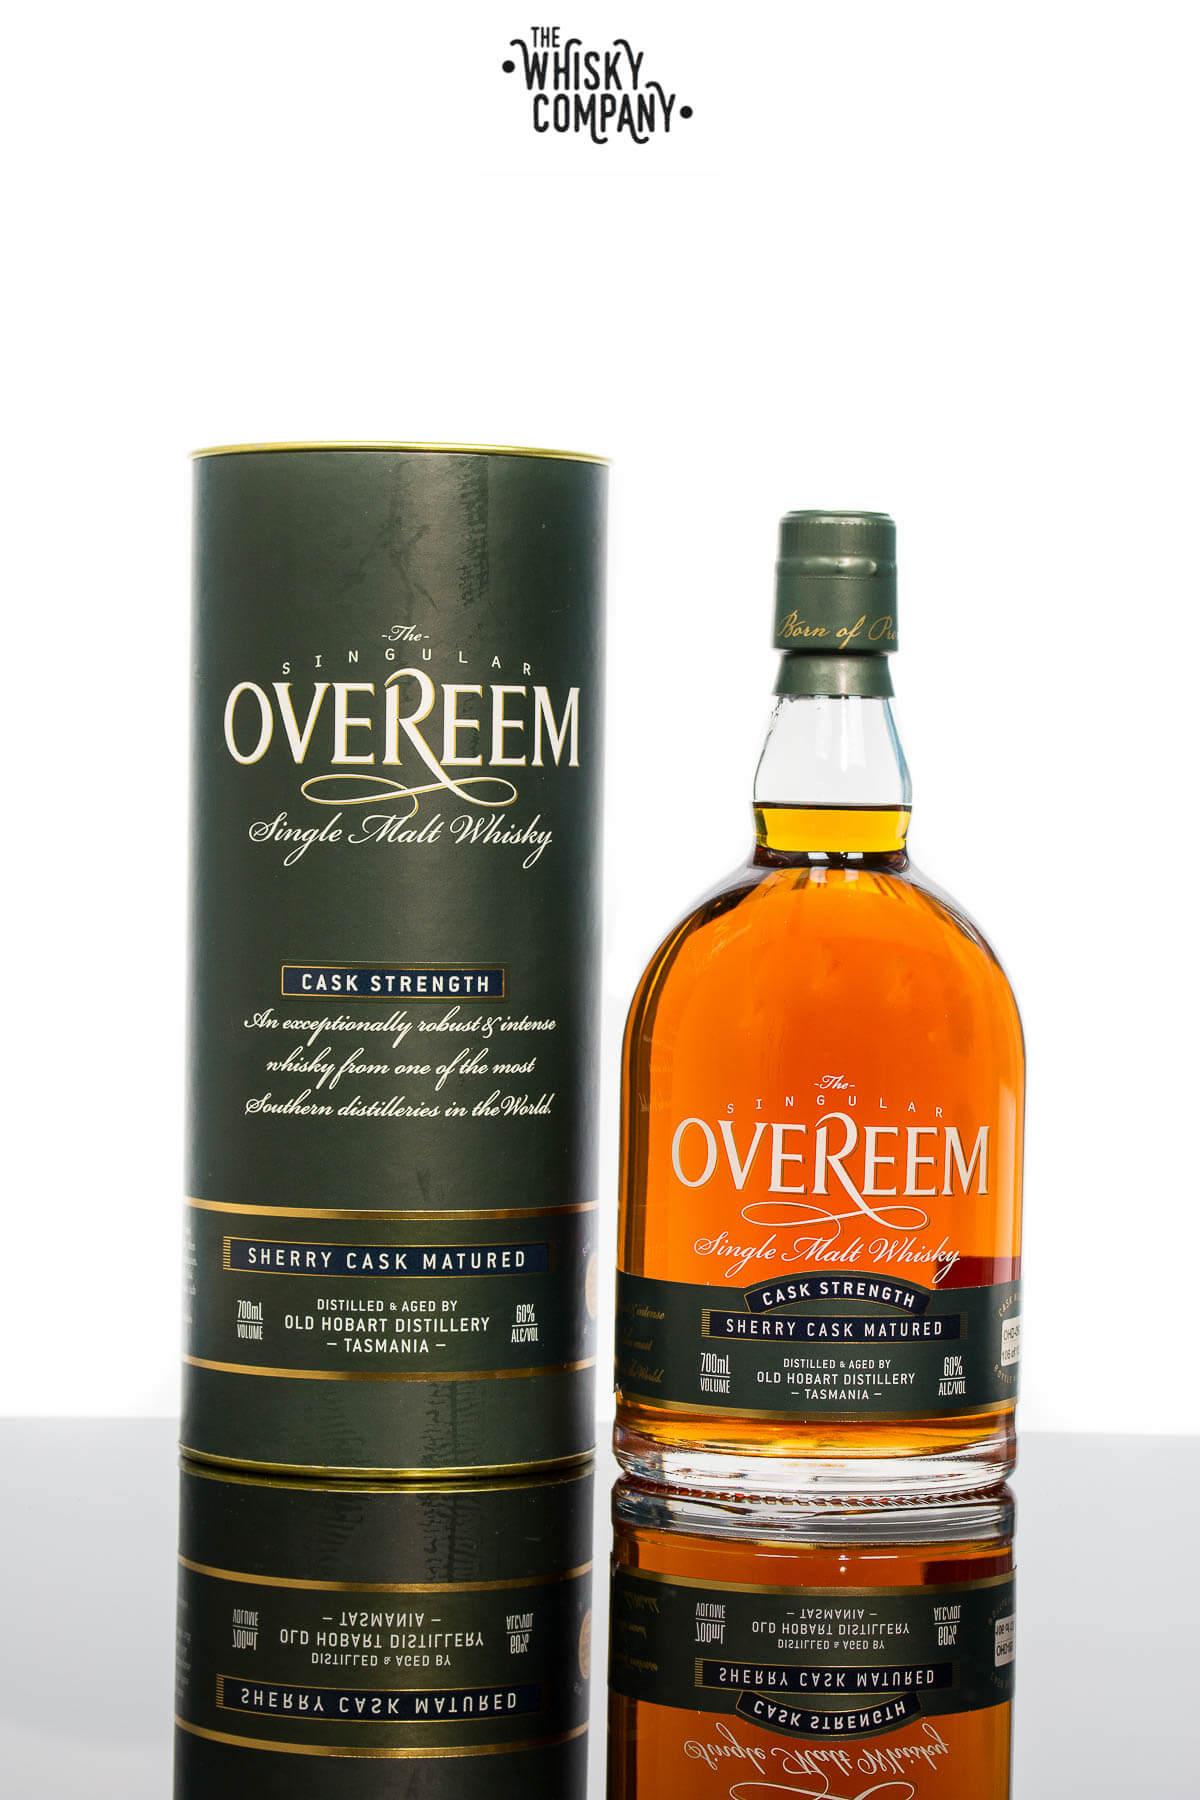 Overeem Cask Strength Sherry Cask Matured Tasmanian Single Malt Whisky (700ml)